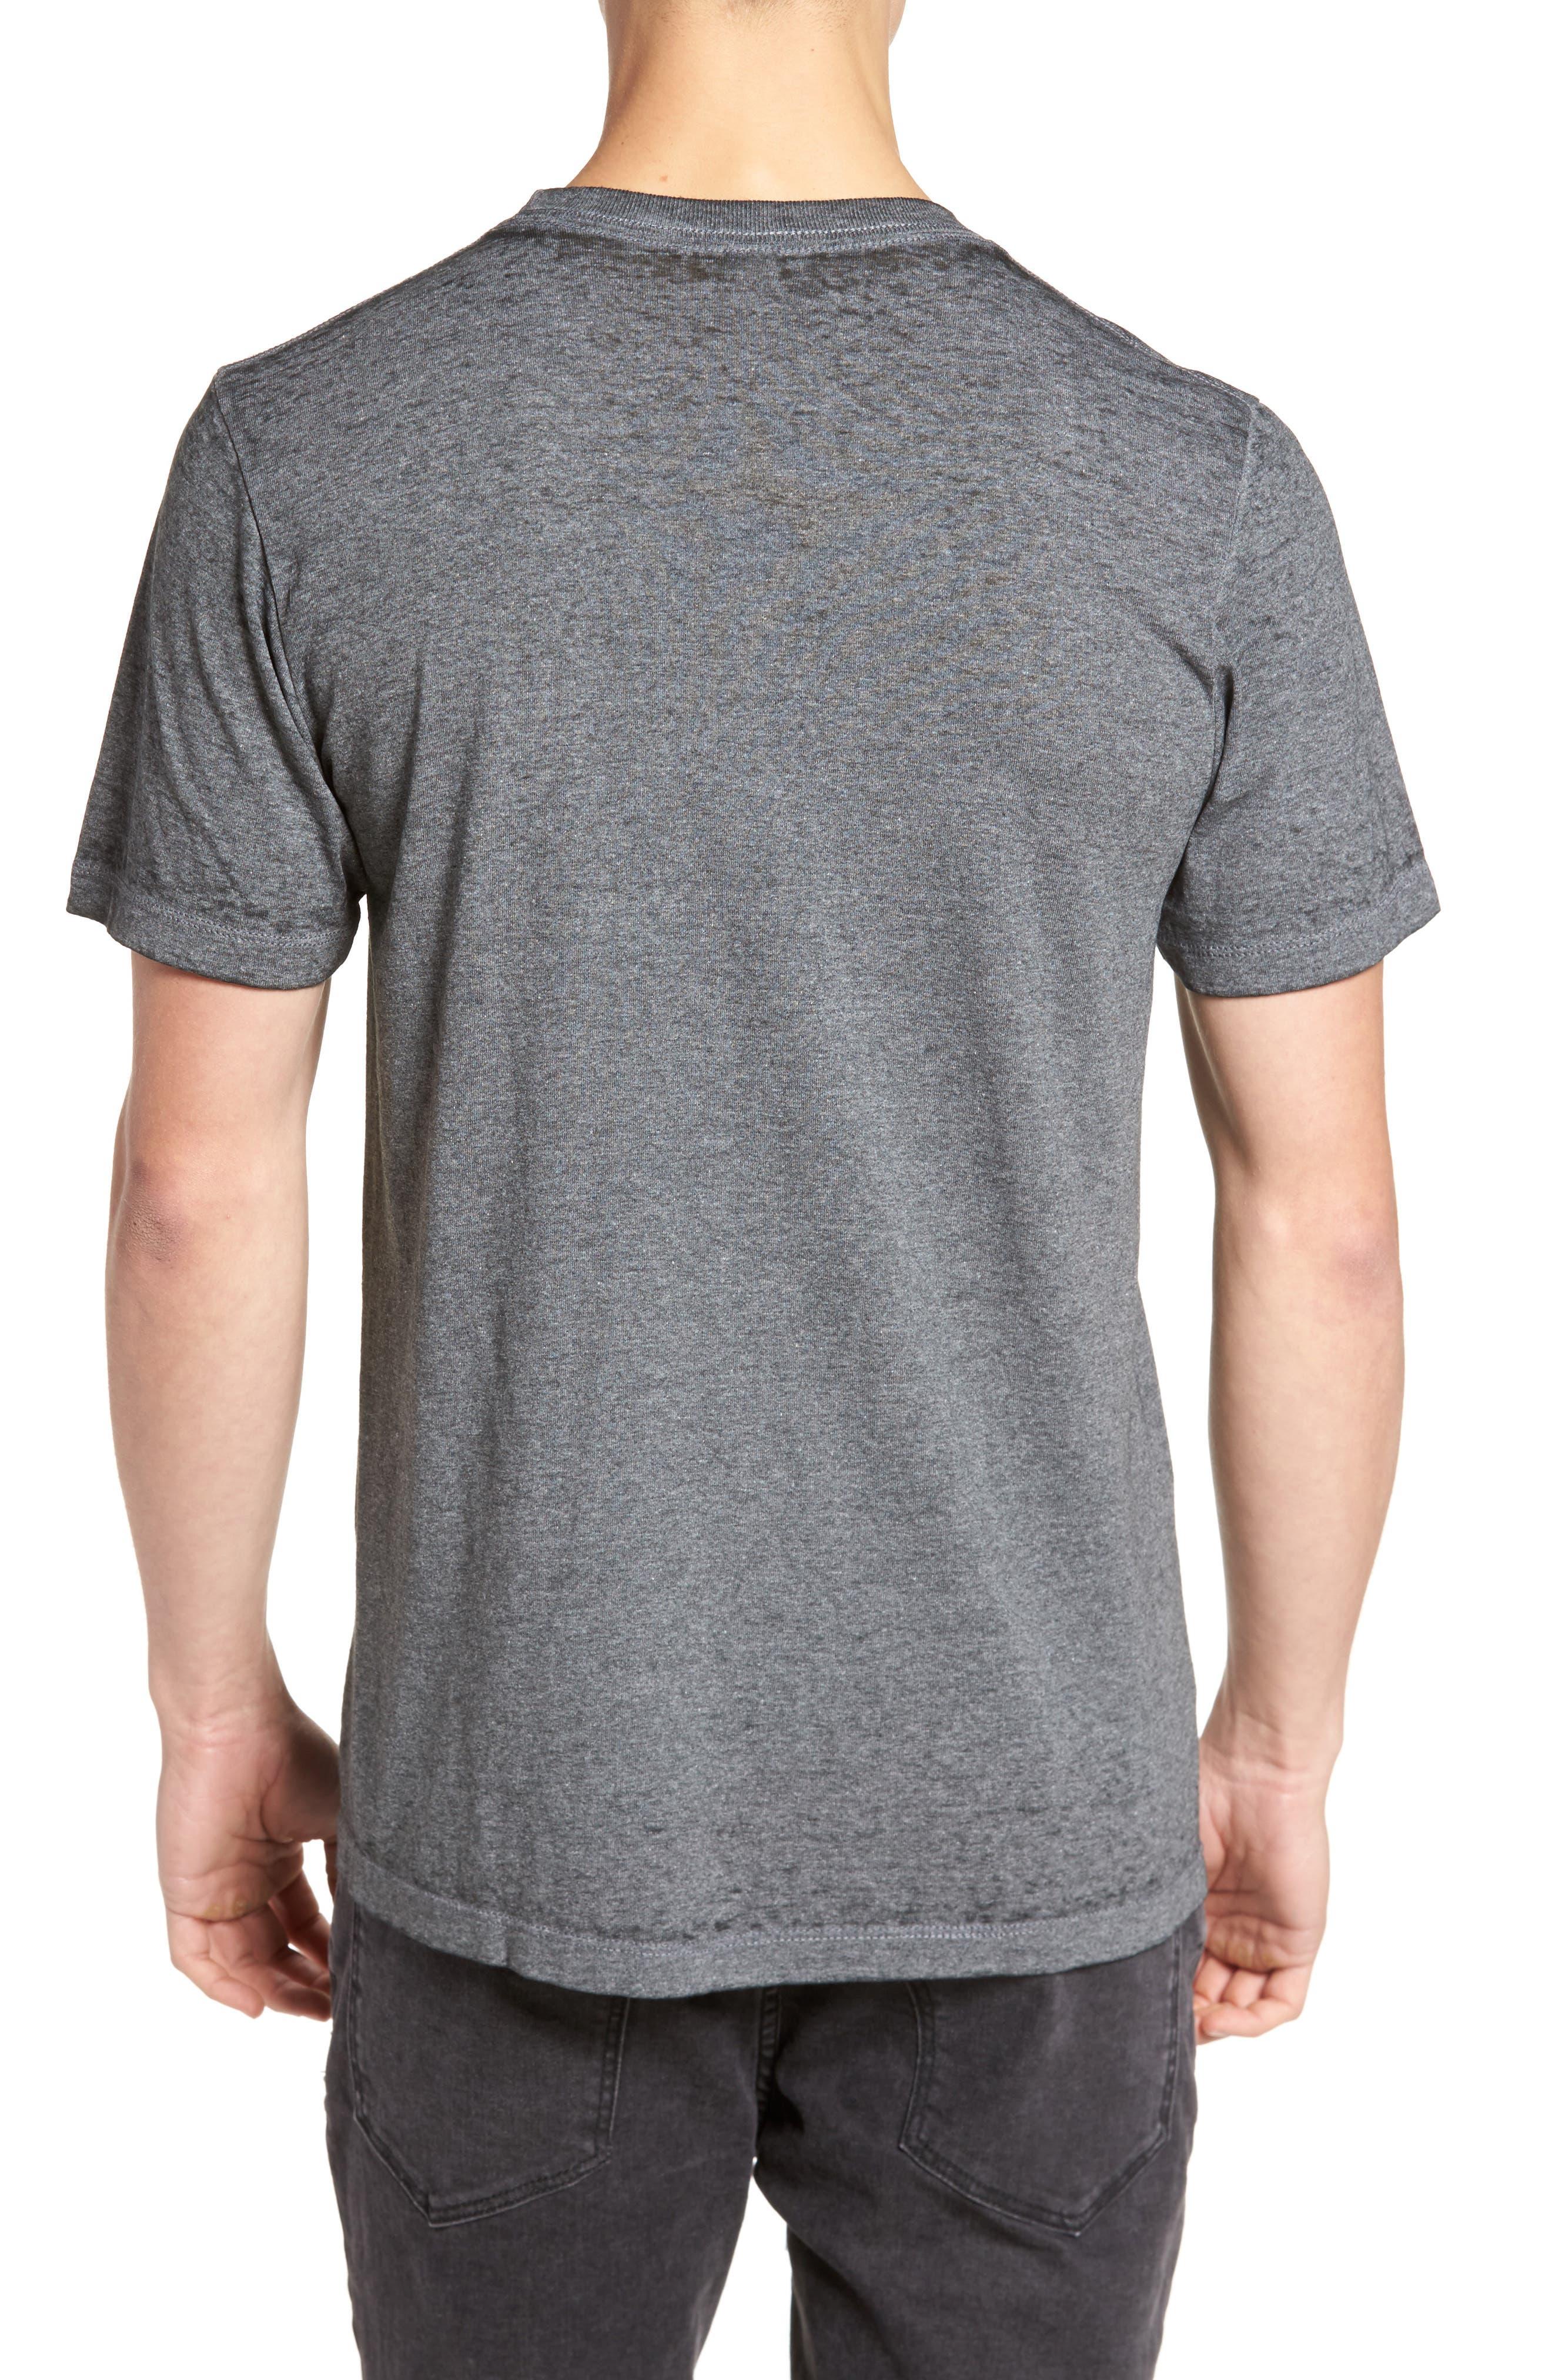 Misfits Short Sleeve T-Shirt,                             Alternate thumbnail 2, color,                             Black Misfits Ouija